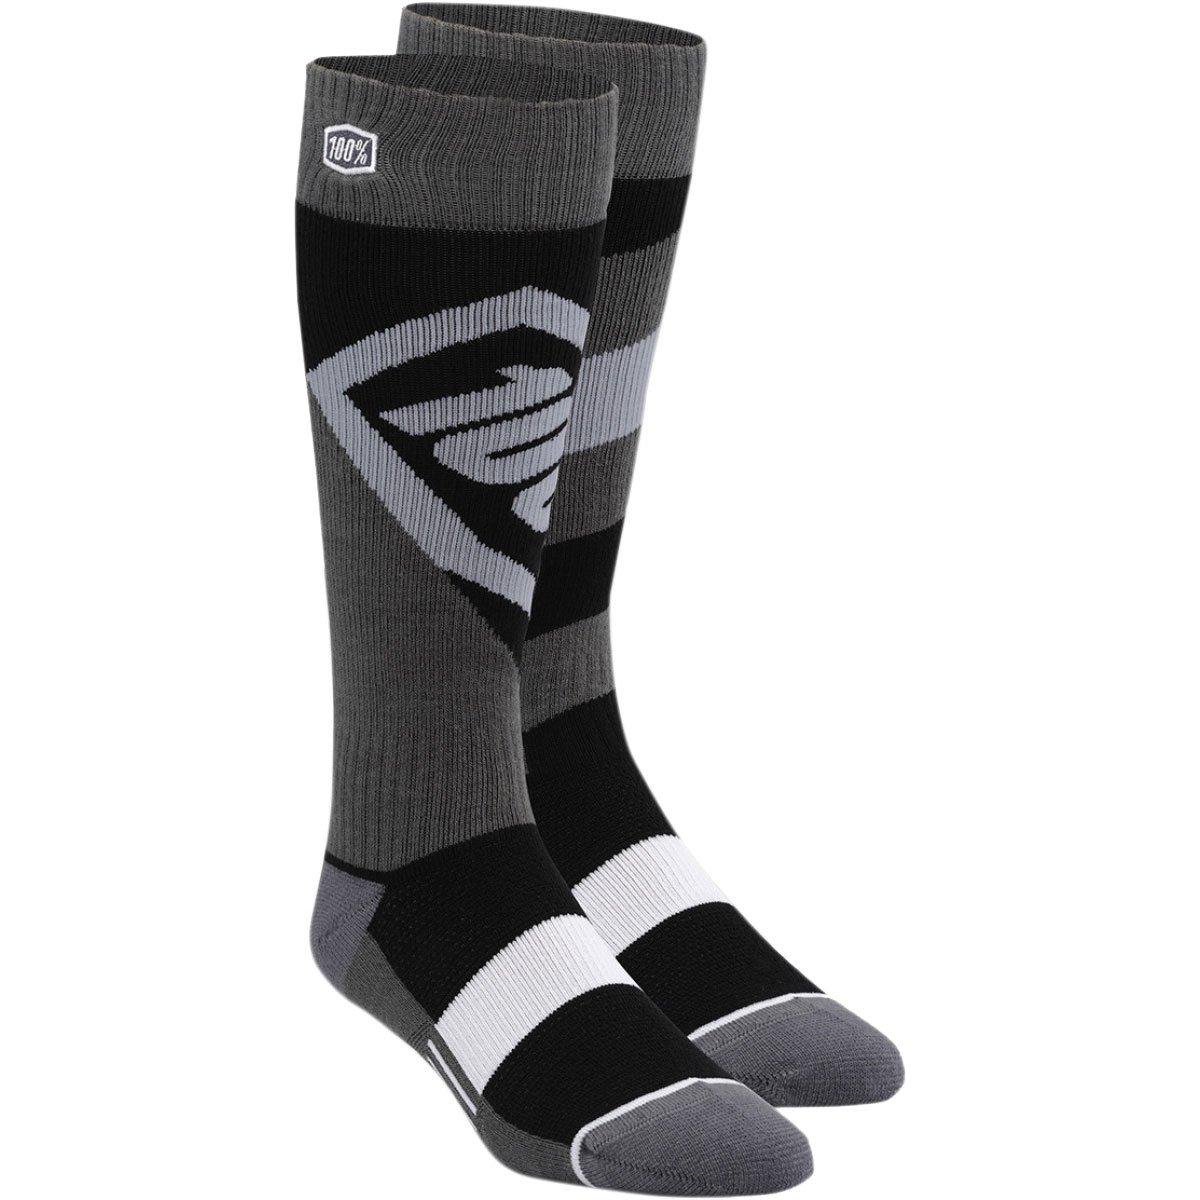 100% 24107-001-18 Unisex-Child Youth Torque 8'' Mid-Calf Riding Socks (Black,Large/X-Large)